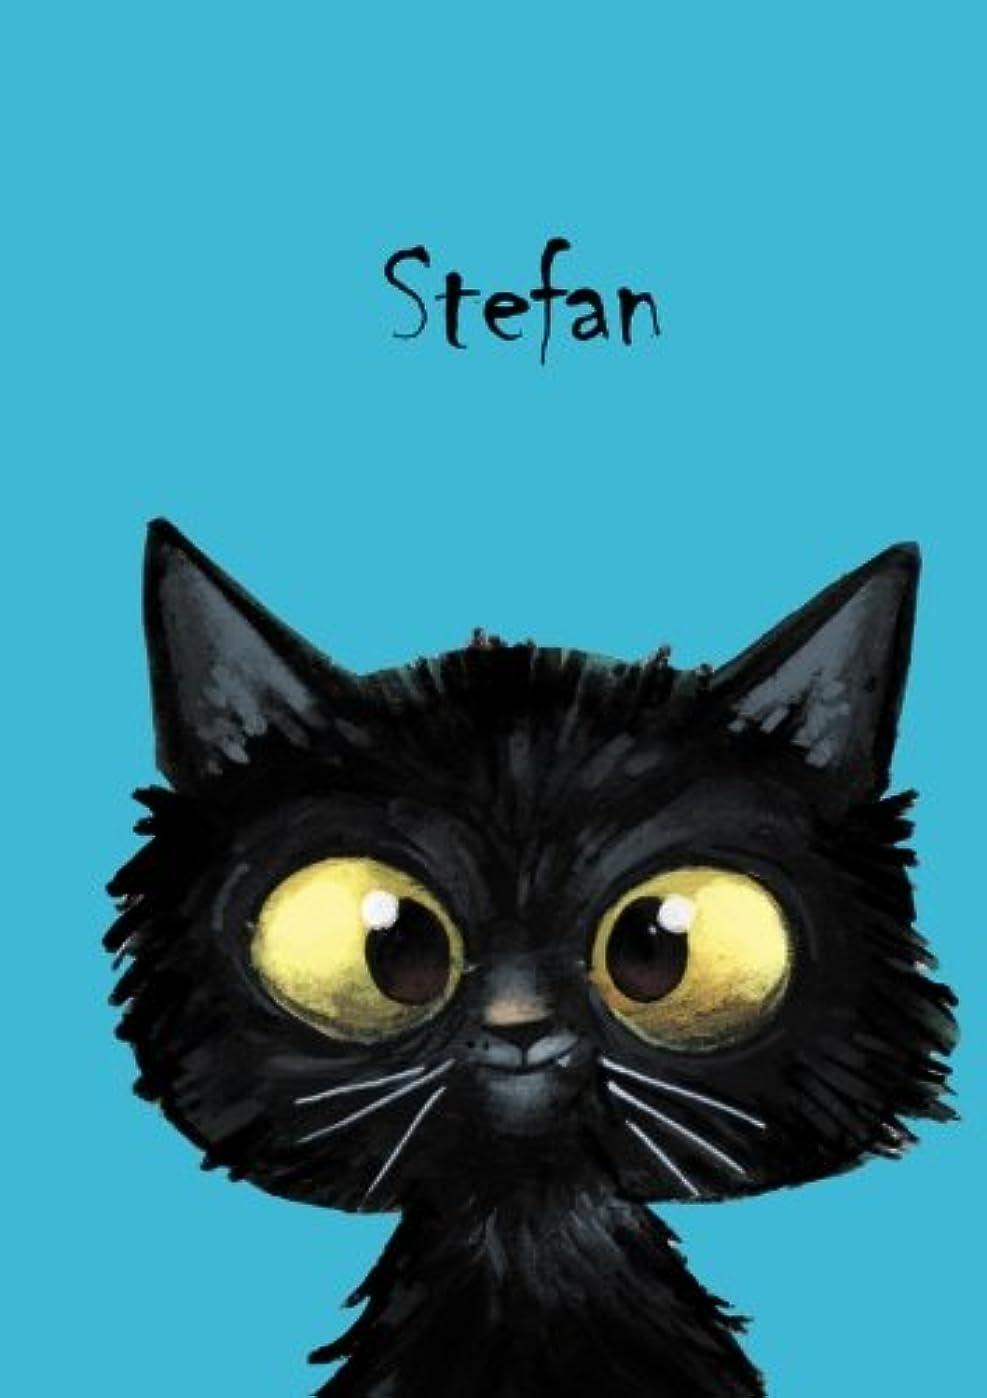 悪因子自転車バッフルStefan: Personalisiertes Notizbuch, DIN A5, 80 blanko Seiten mit kleiner Katze auf jeder rechten unteren Seite. Durch Vornamen auf dem Cover, eine schoene kleine Aufmerksamkeit fuer Katzenfreunde. Mattes, handschmeichelndes Coverfinish. Ueber 2500 Namen bereits verf